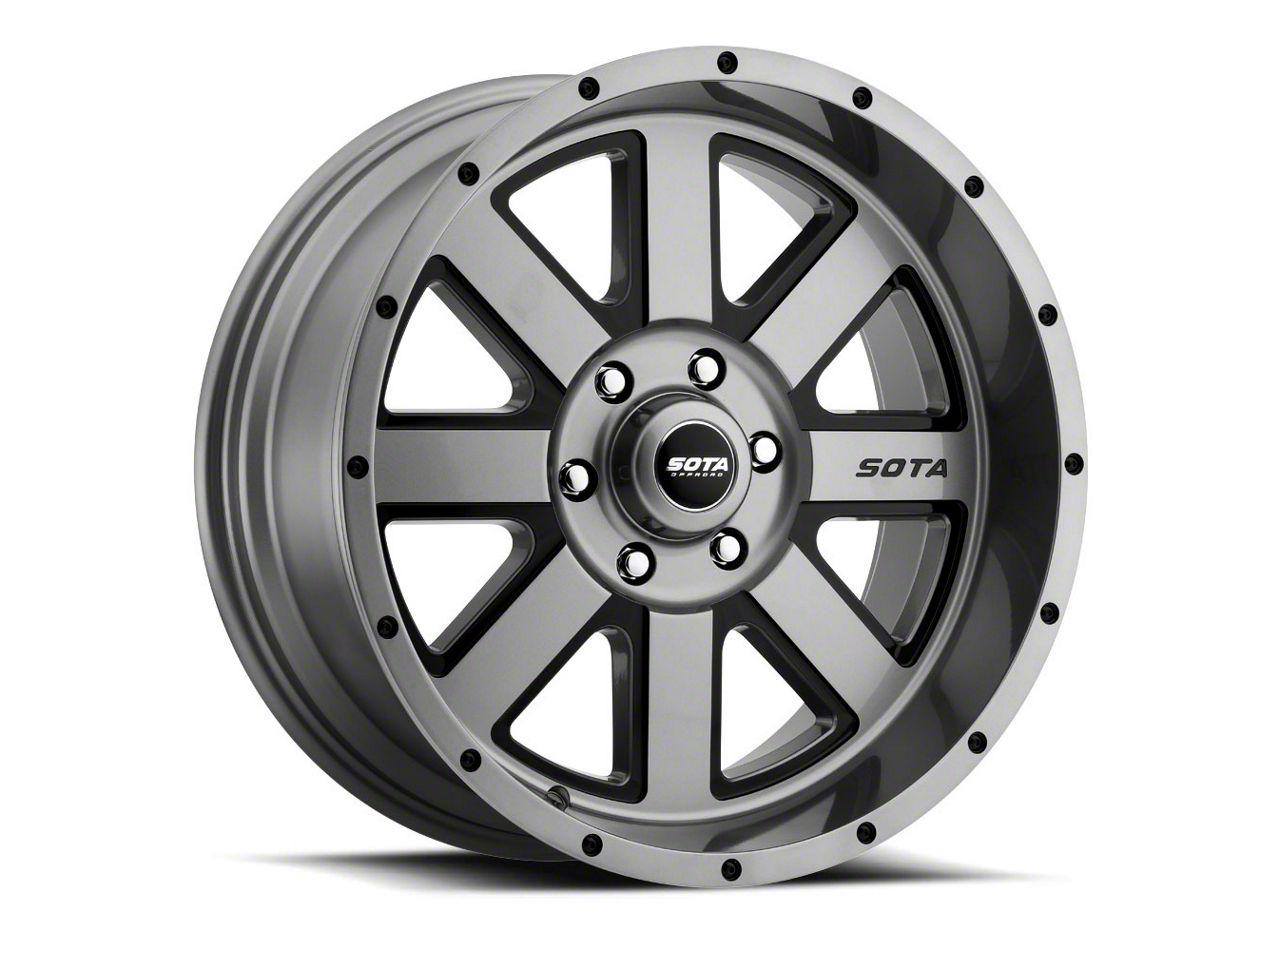 SOTA Off Road A.W.O.L. Anthra-Kote Black 6-Lug Wheel - 20x9 (04-18 F-150)